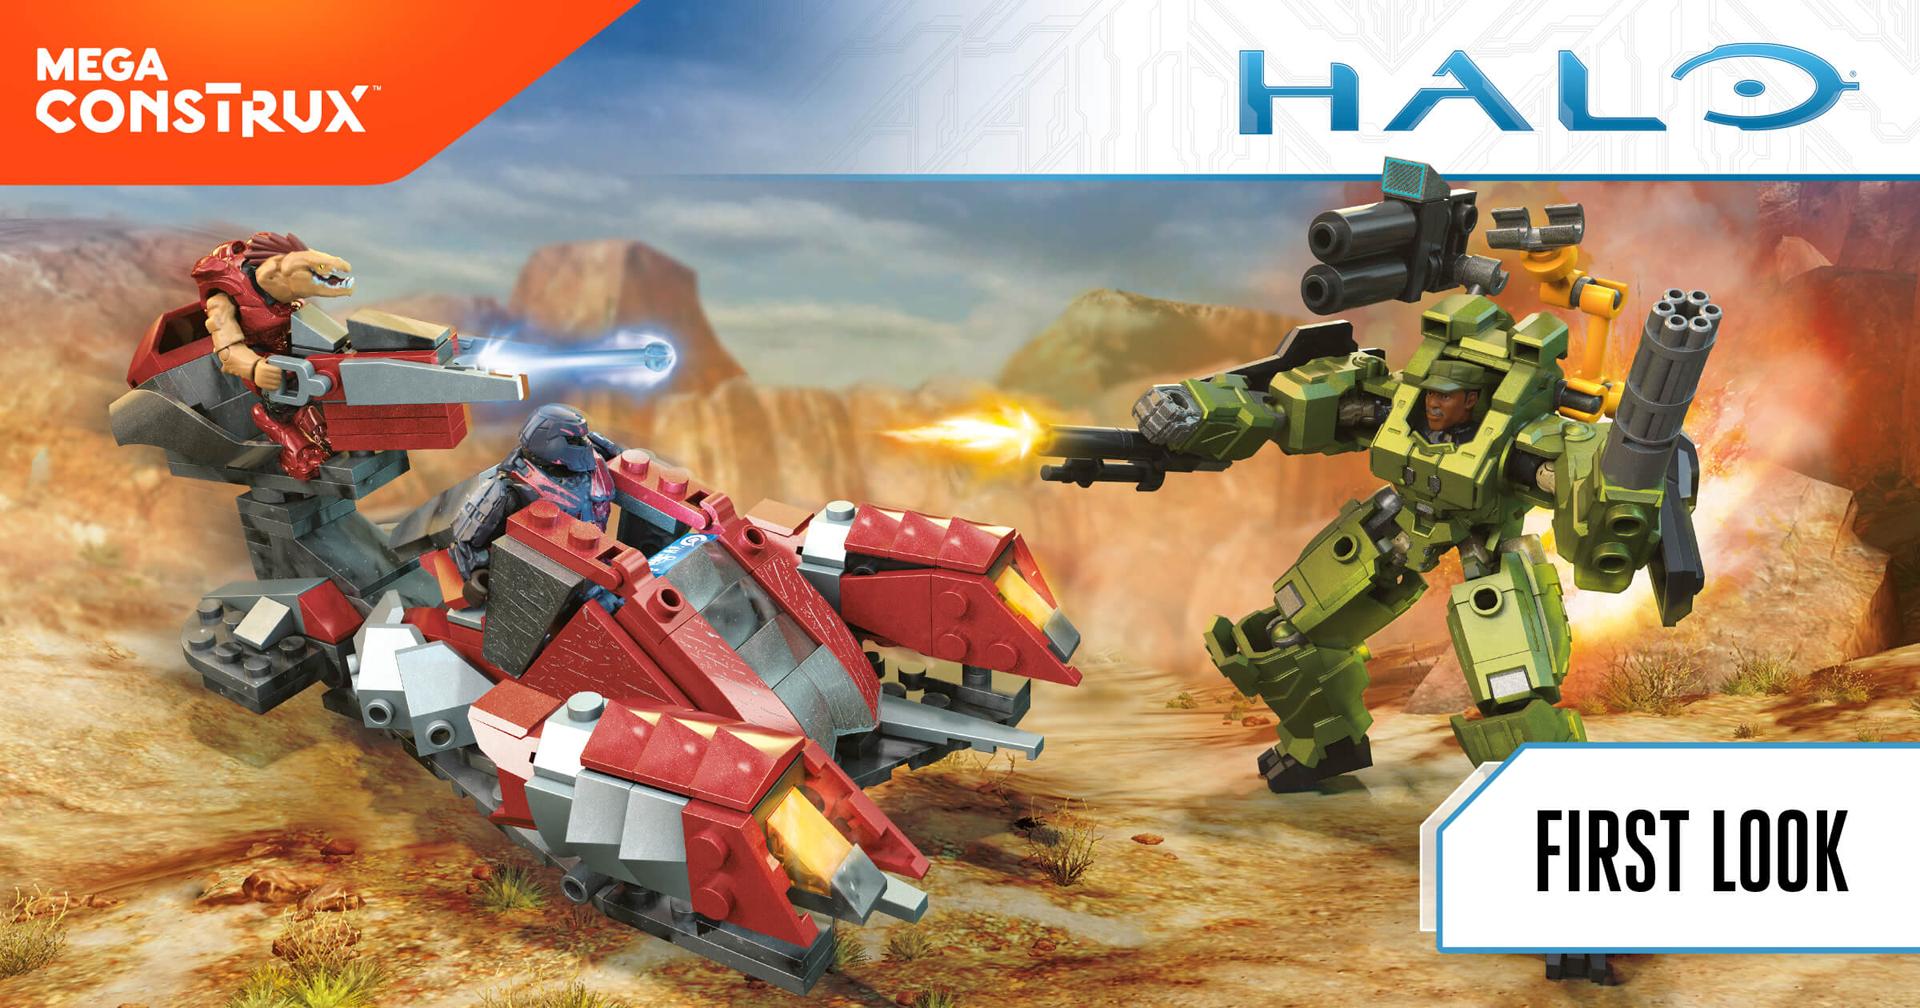 Mega Construx @ Toy Fair 2018   Halo Gear   Halo - Official Site